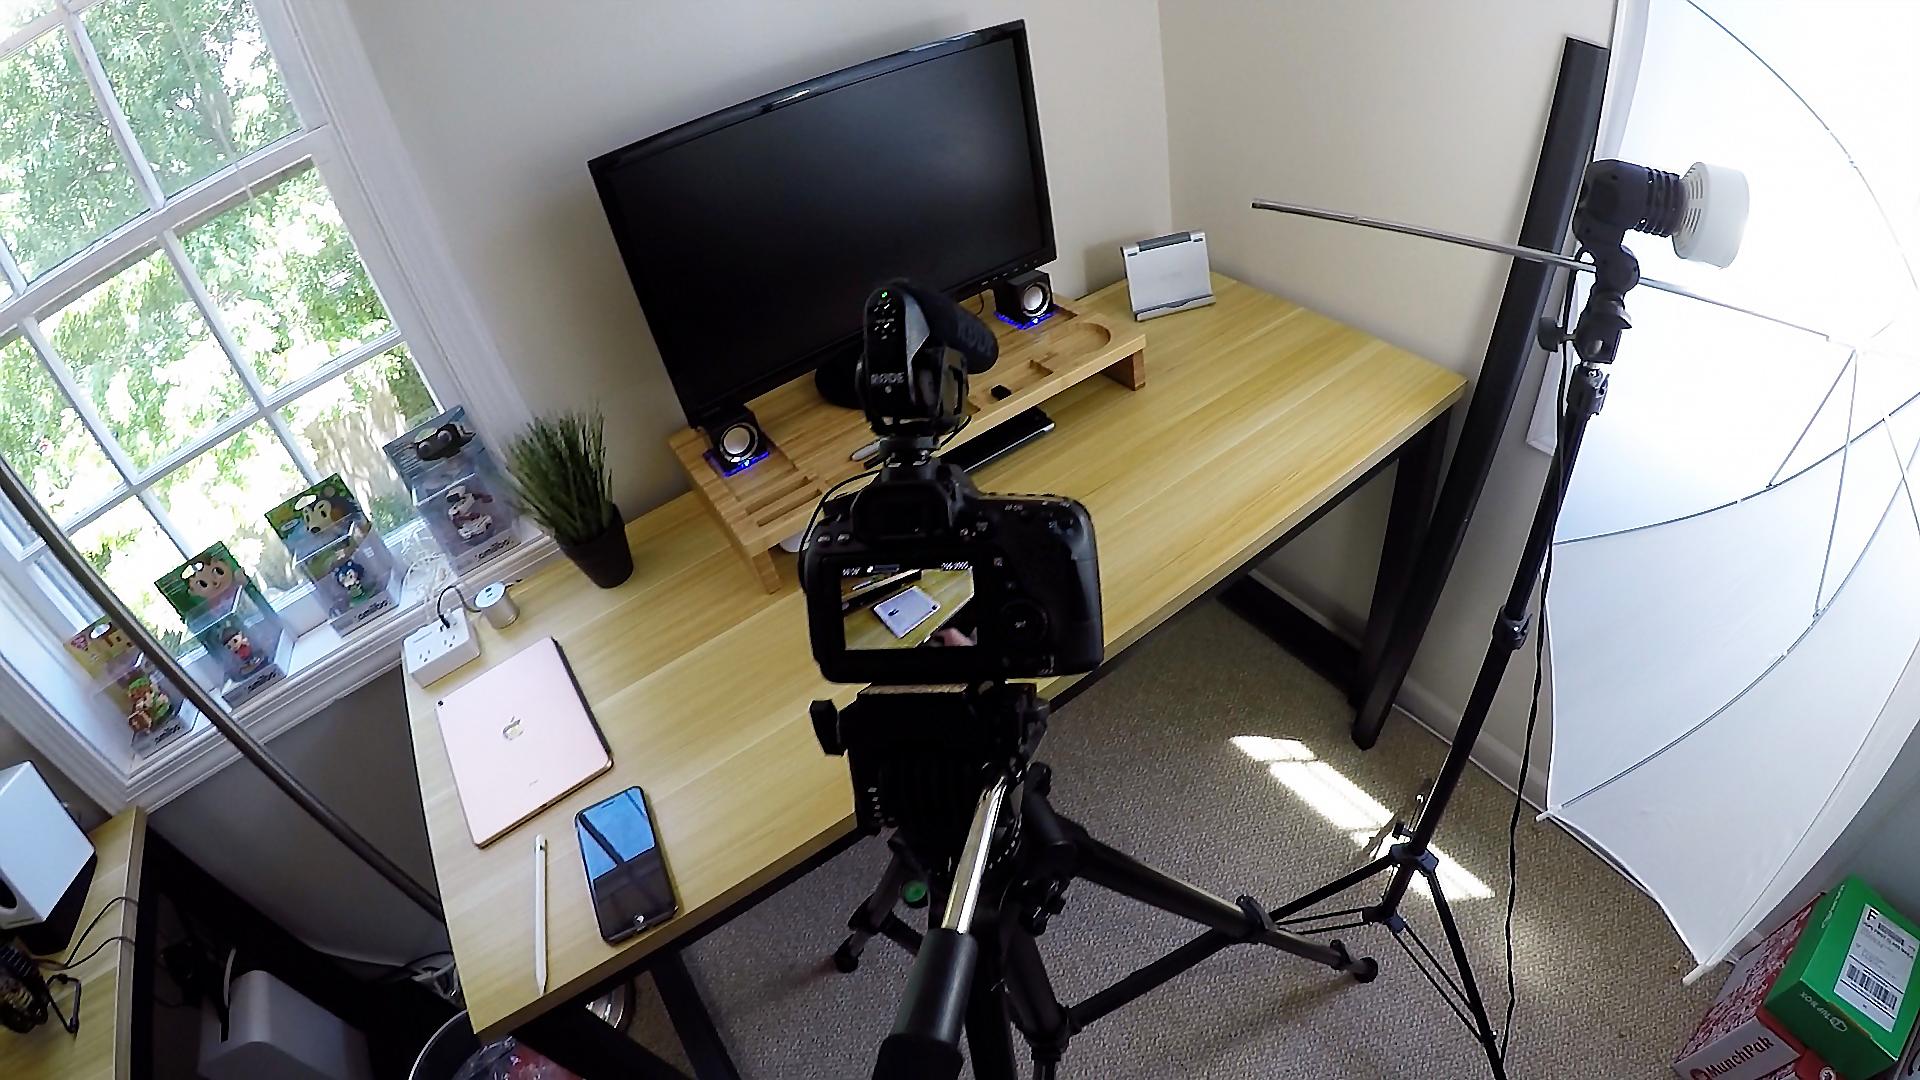 New Setup, More Content